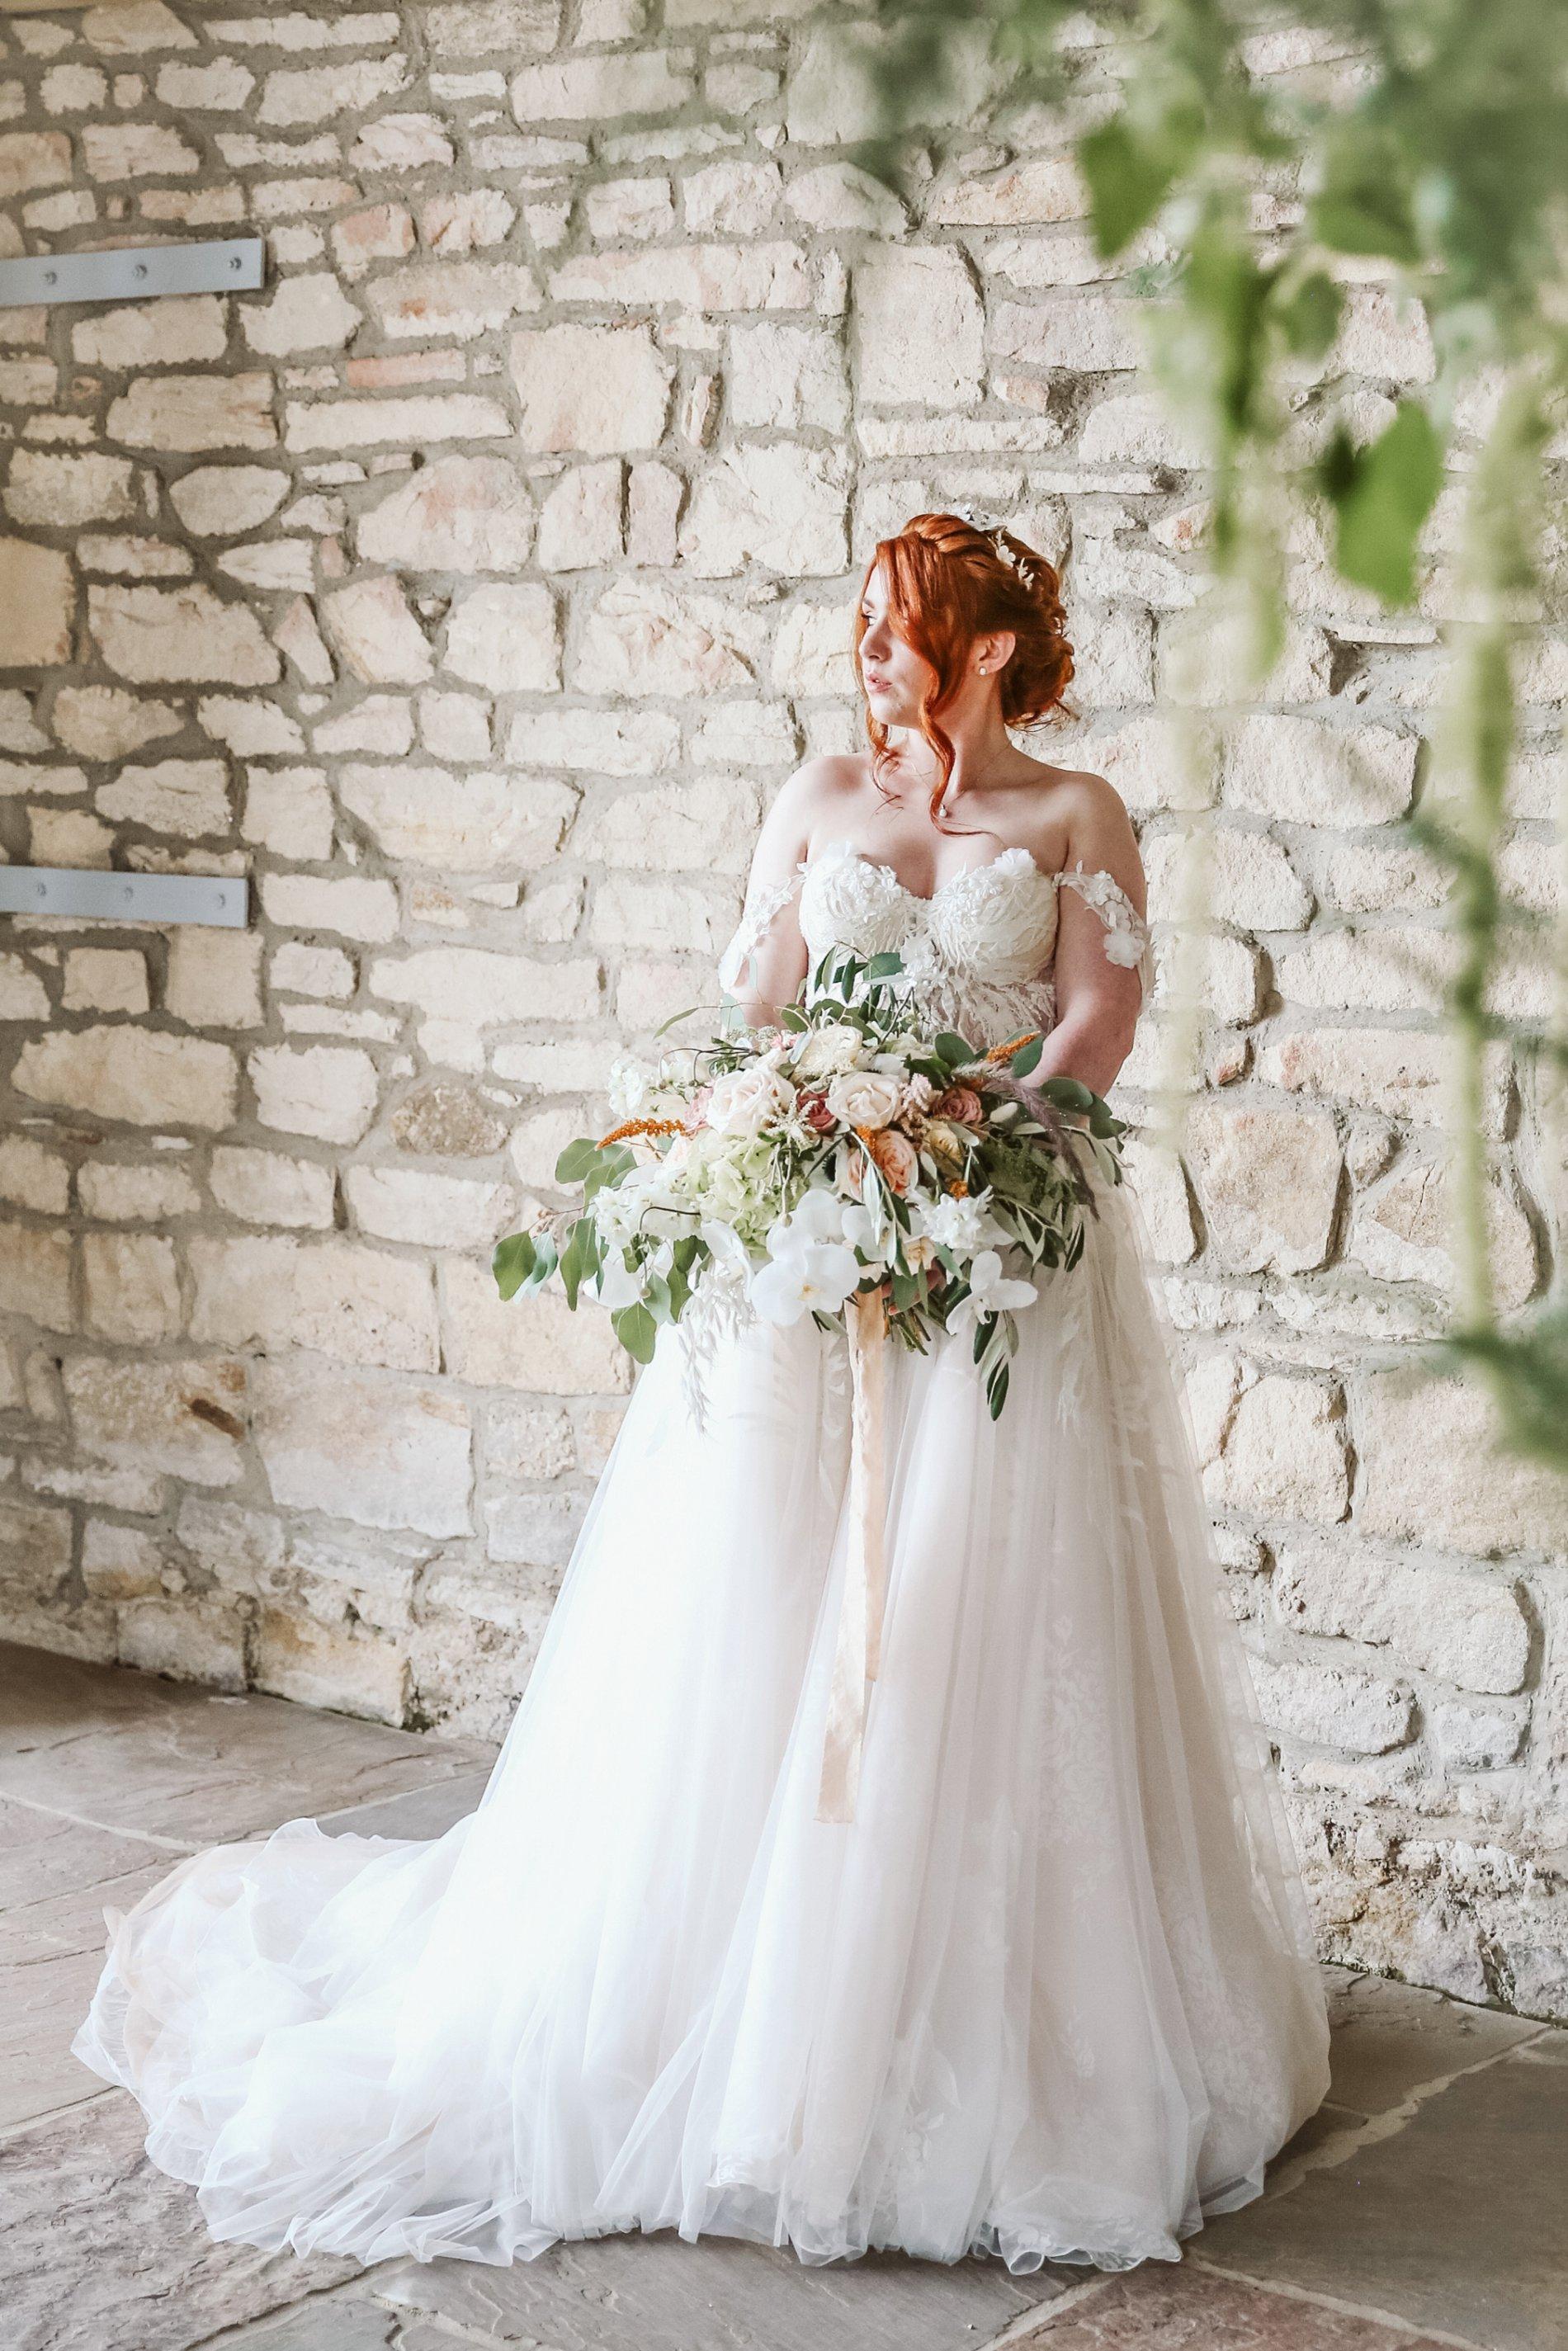 Saying I Do Rustic Wedding Creative Shoot (c) Charlotte Eve Photography (32)